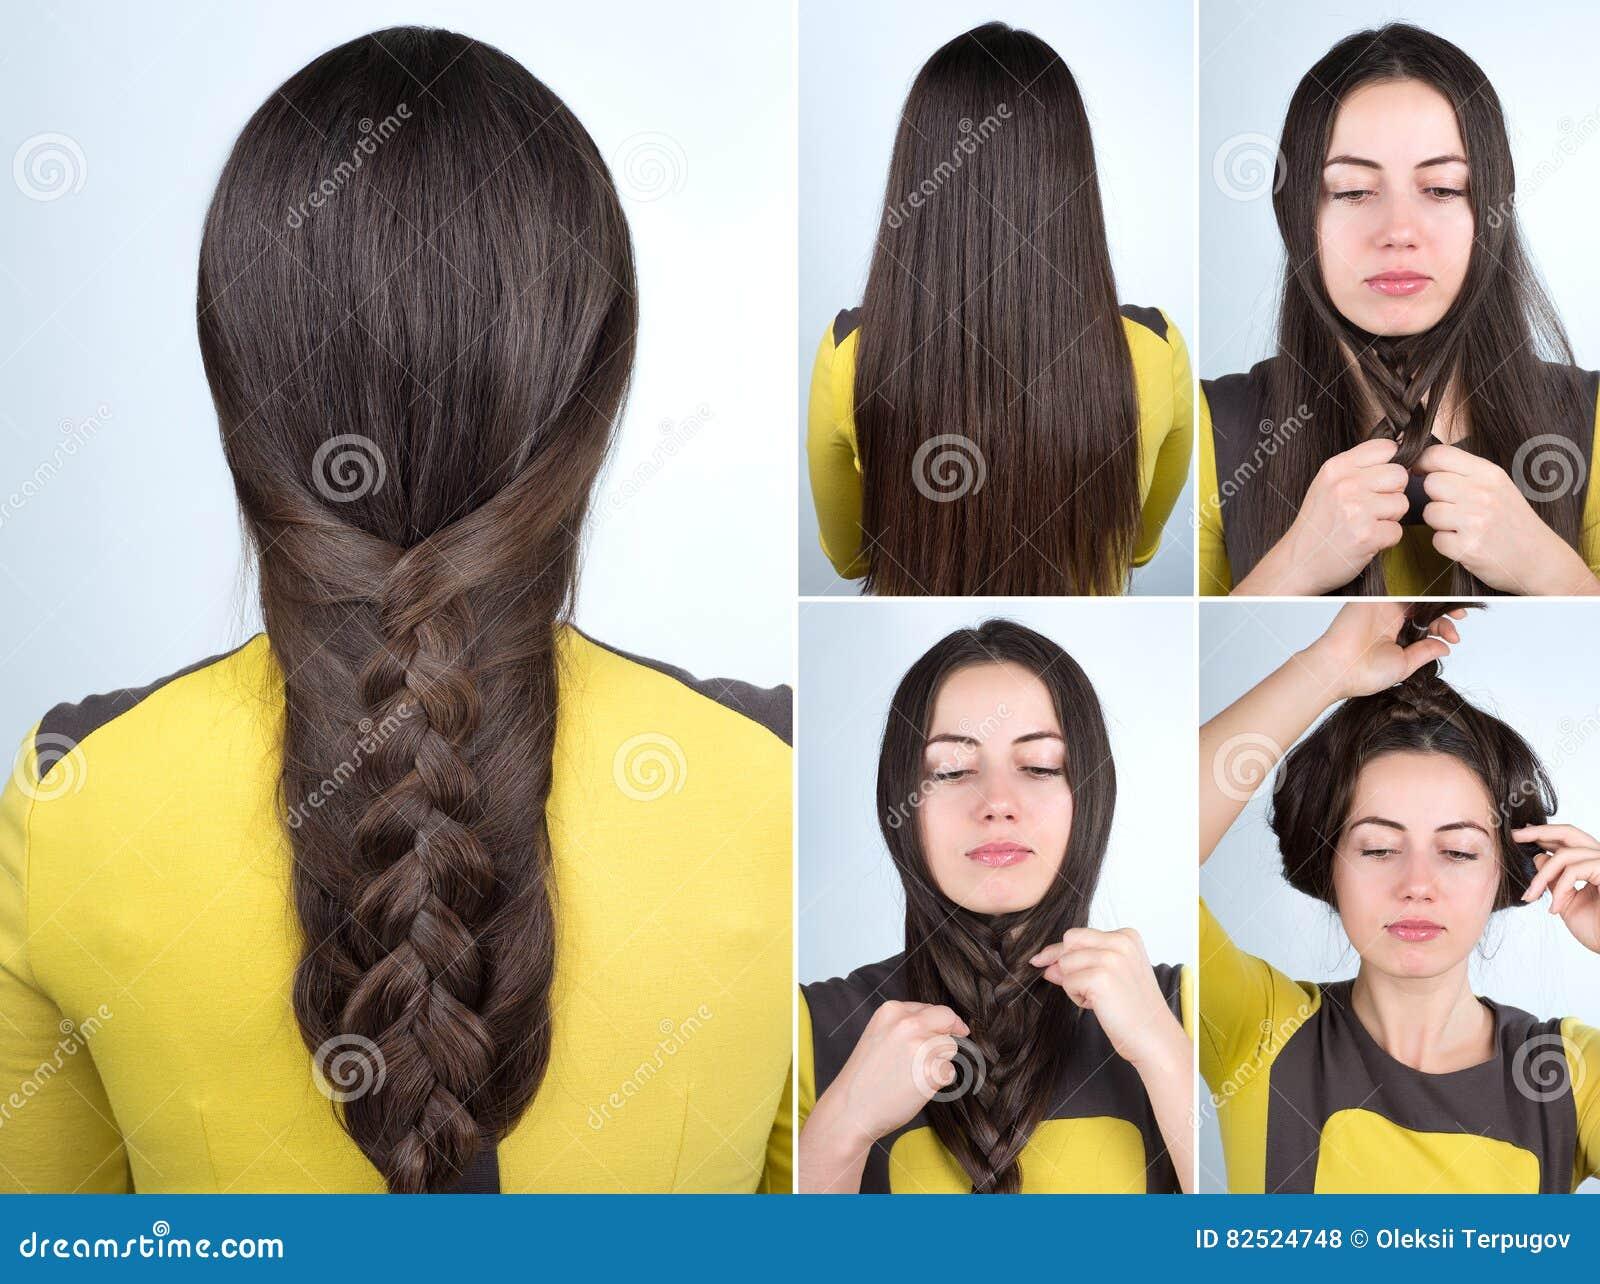 hair braid step by step tutorial